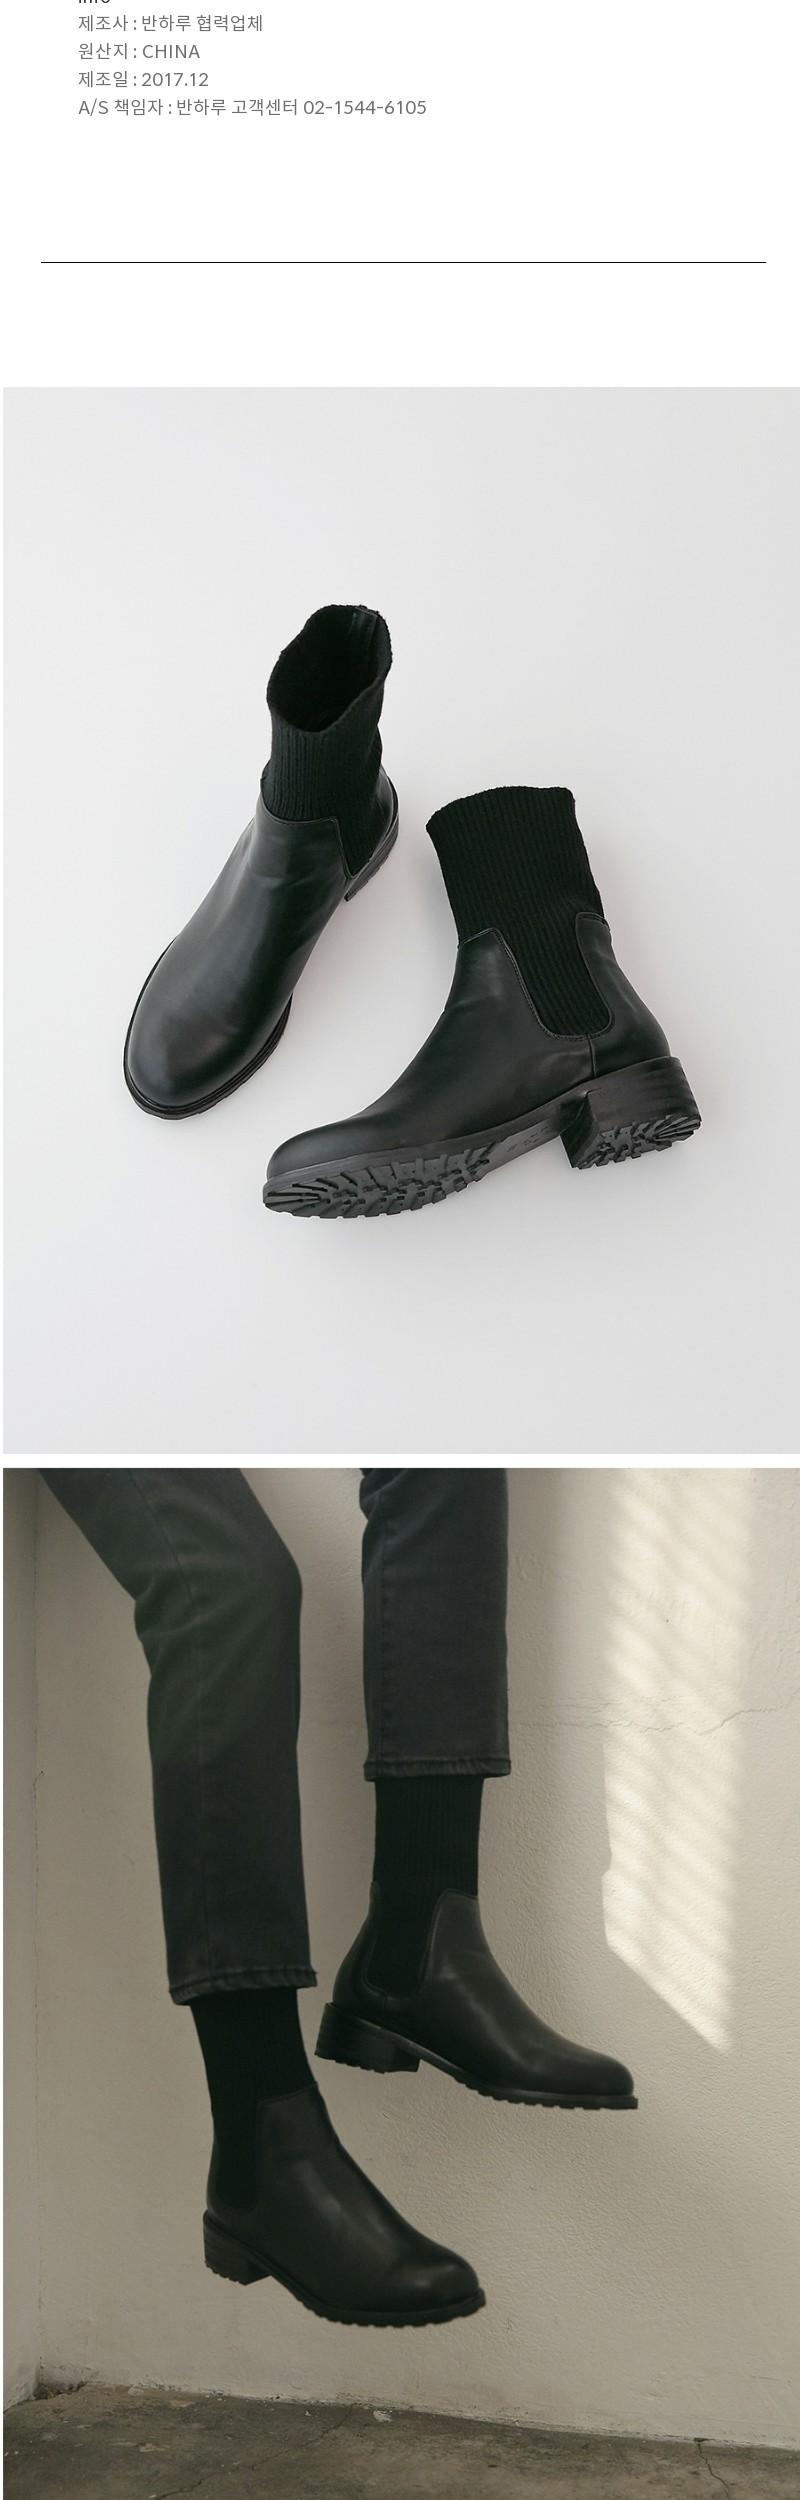 ankle golgi walker